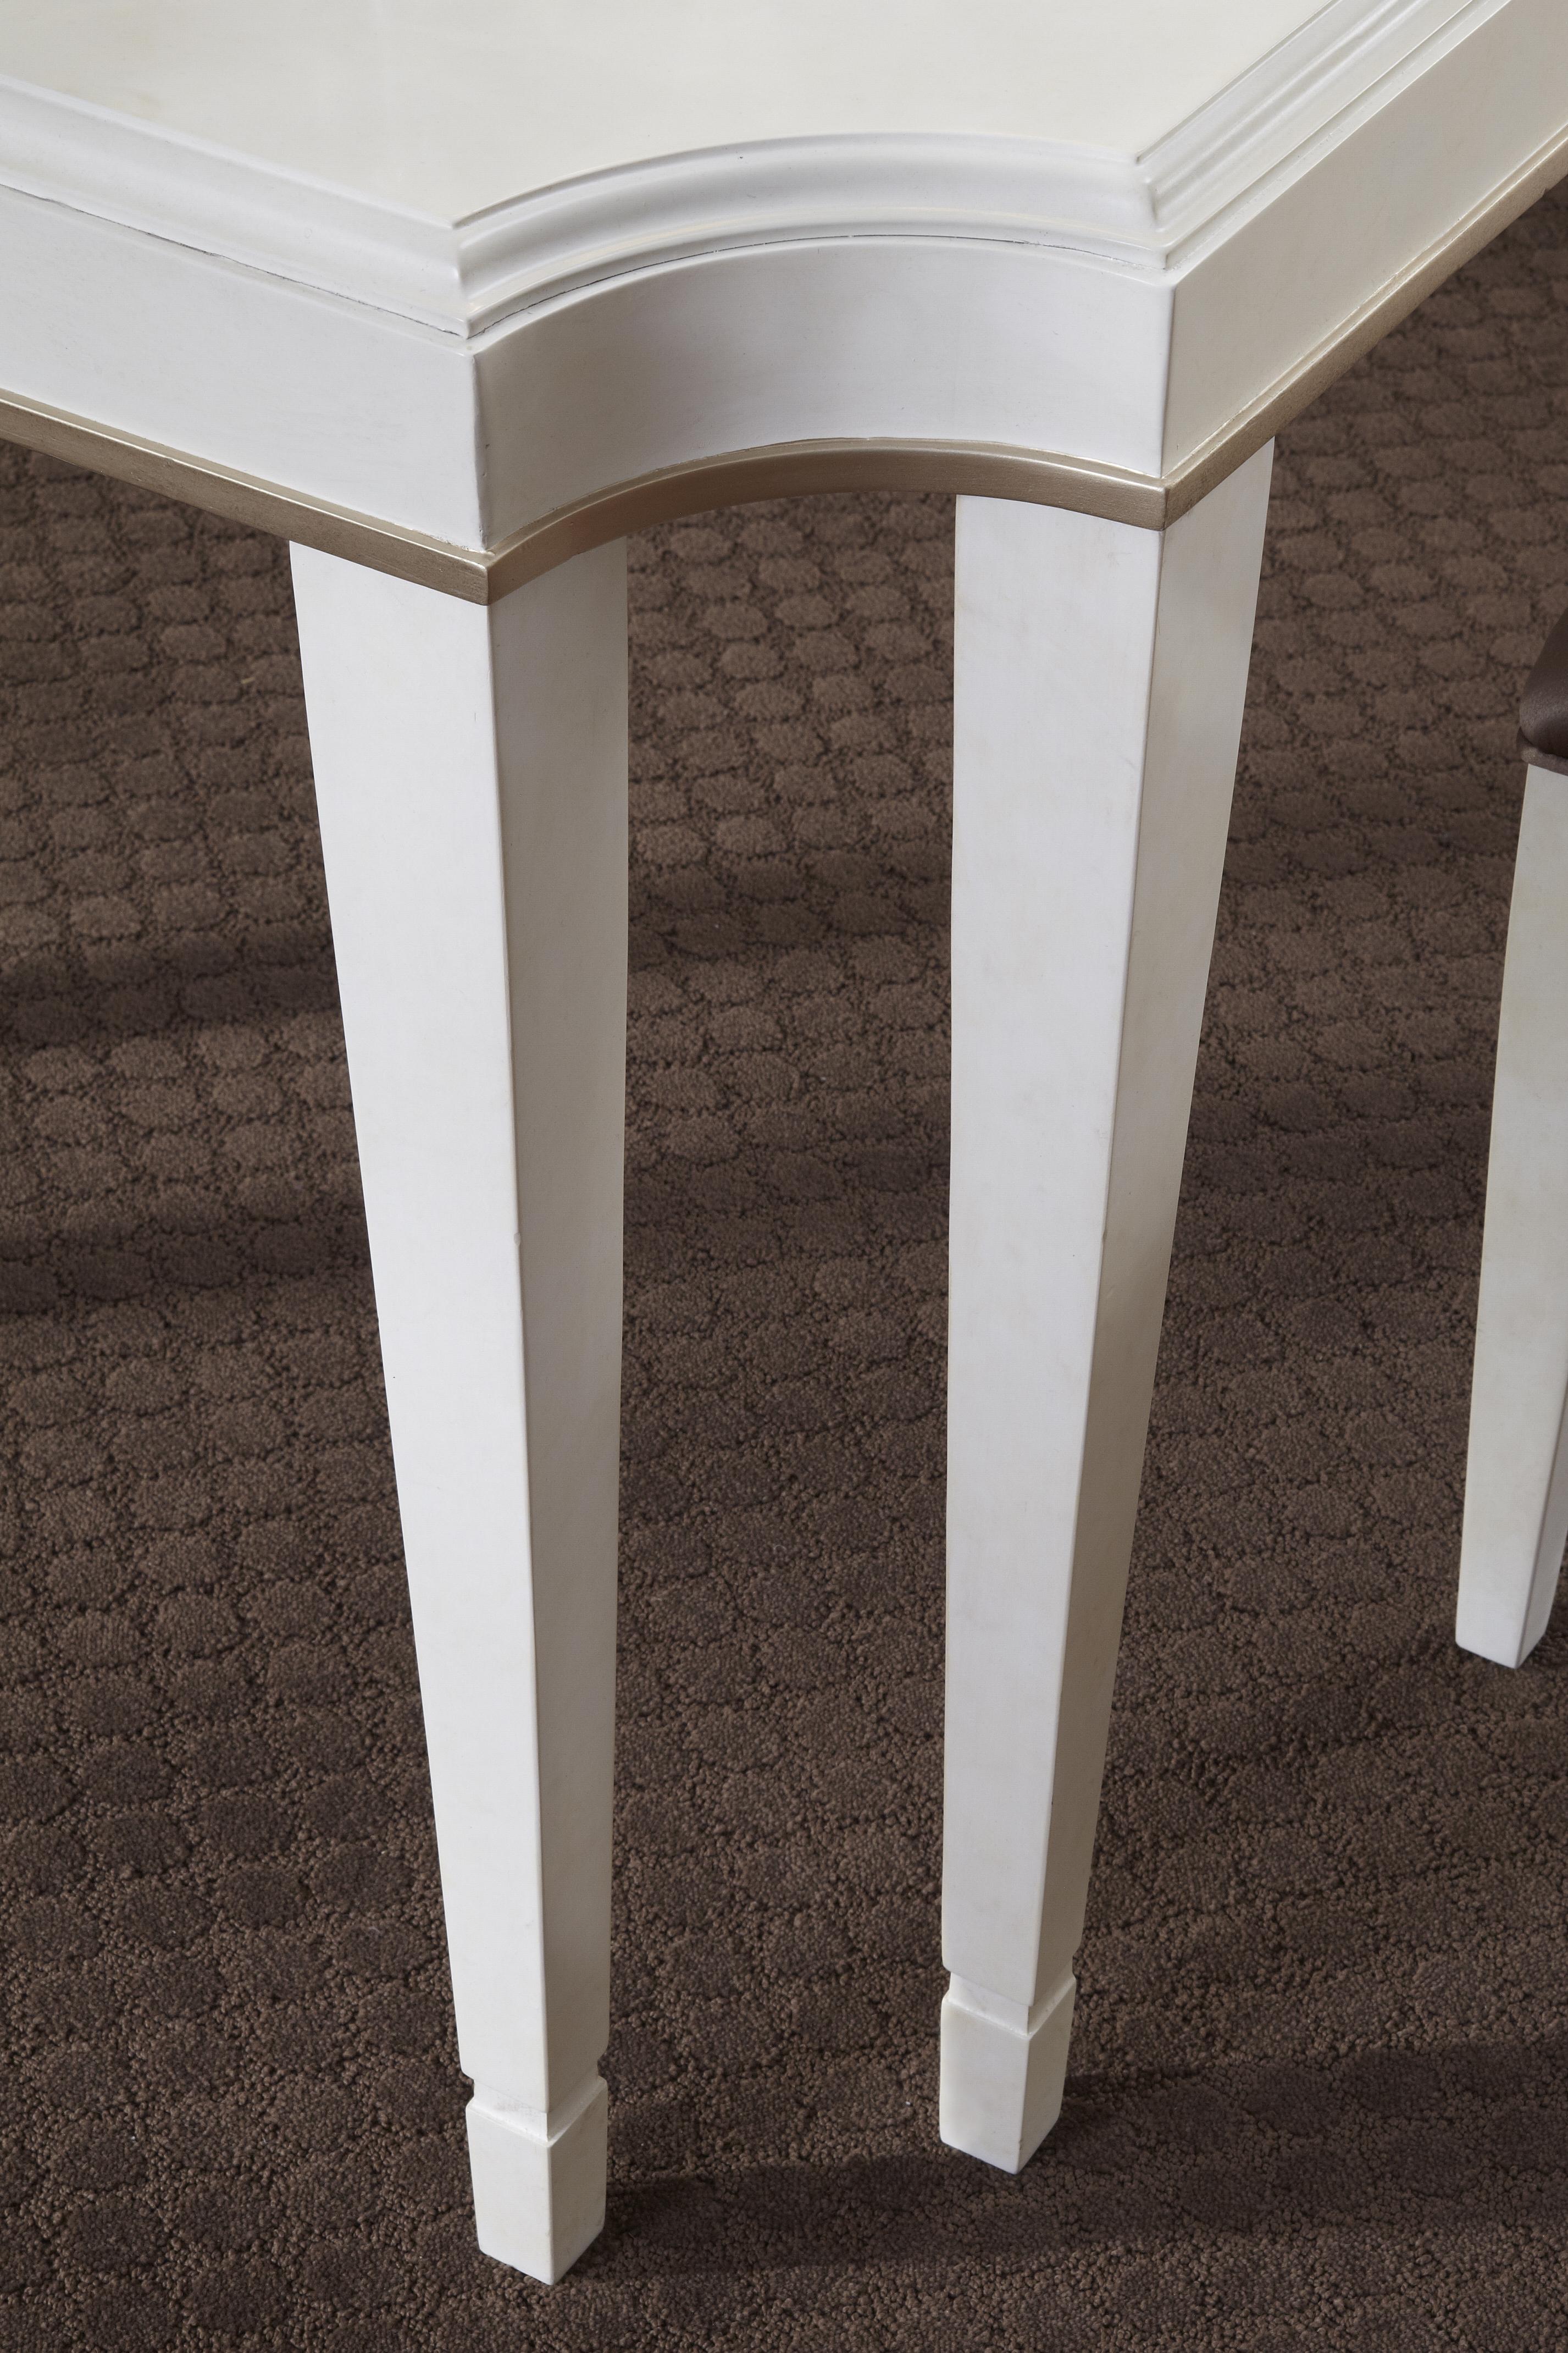 Cosmopolitan 208000 1817 By ART Furniture Inc Baer